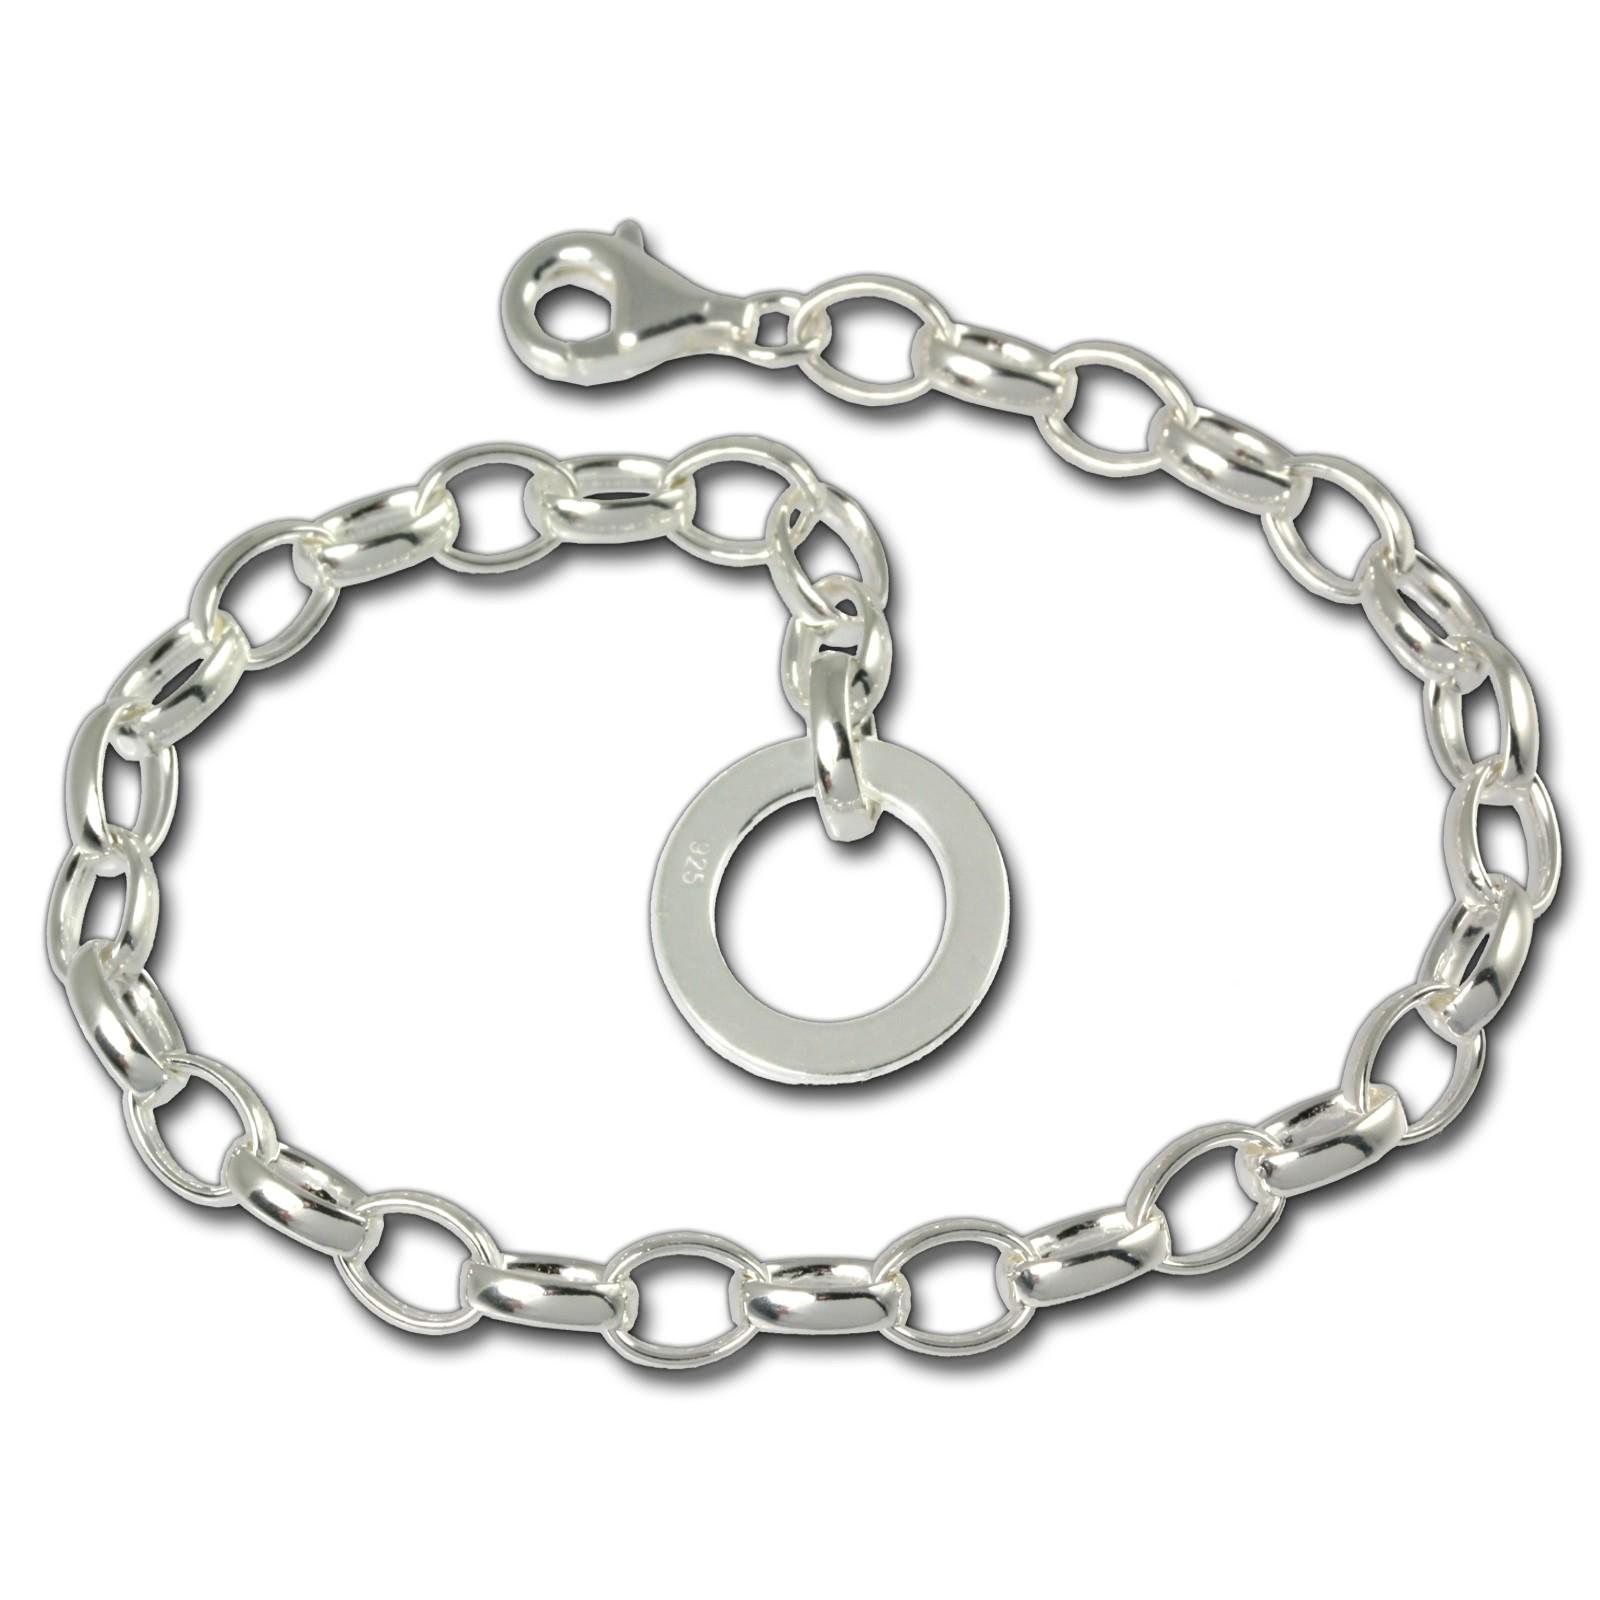 SilberDream Armband mit Plakette 925 Silber Charm Bettelarmband 21cm FC0704